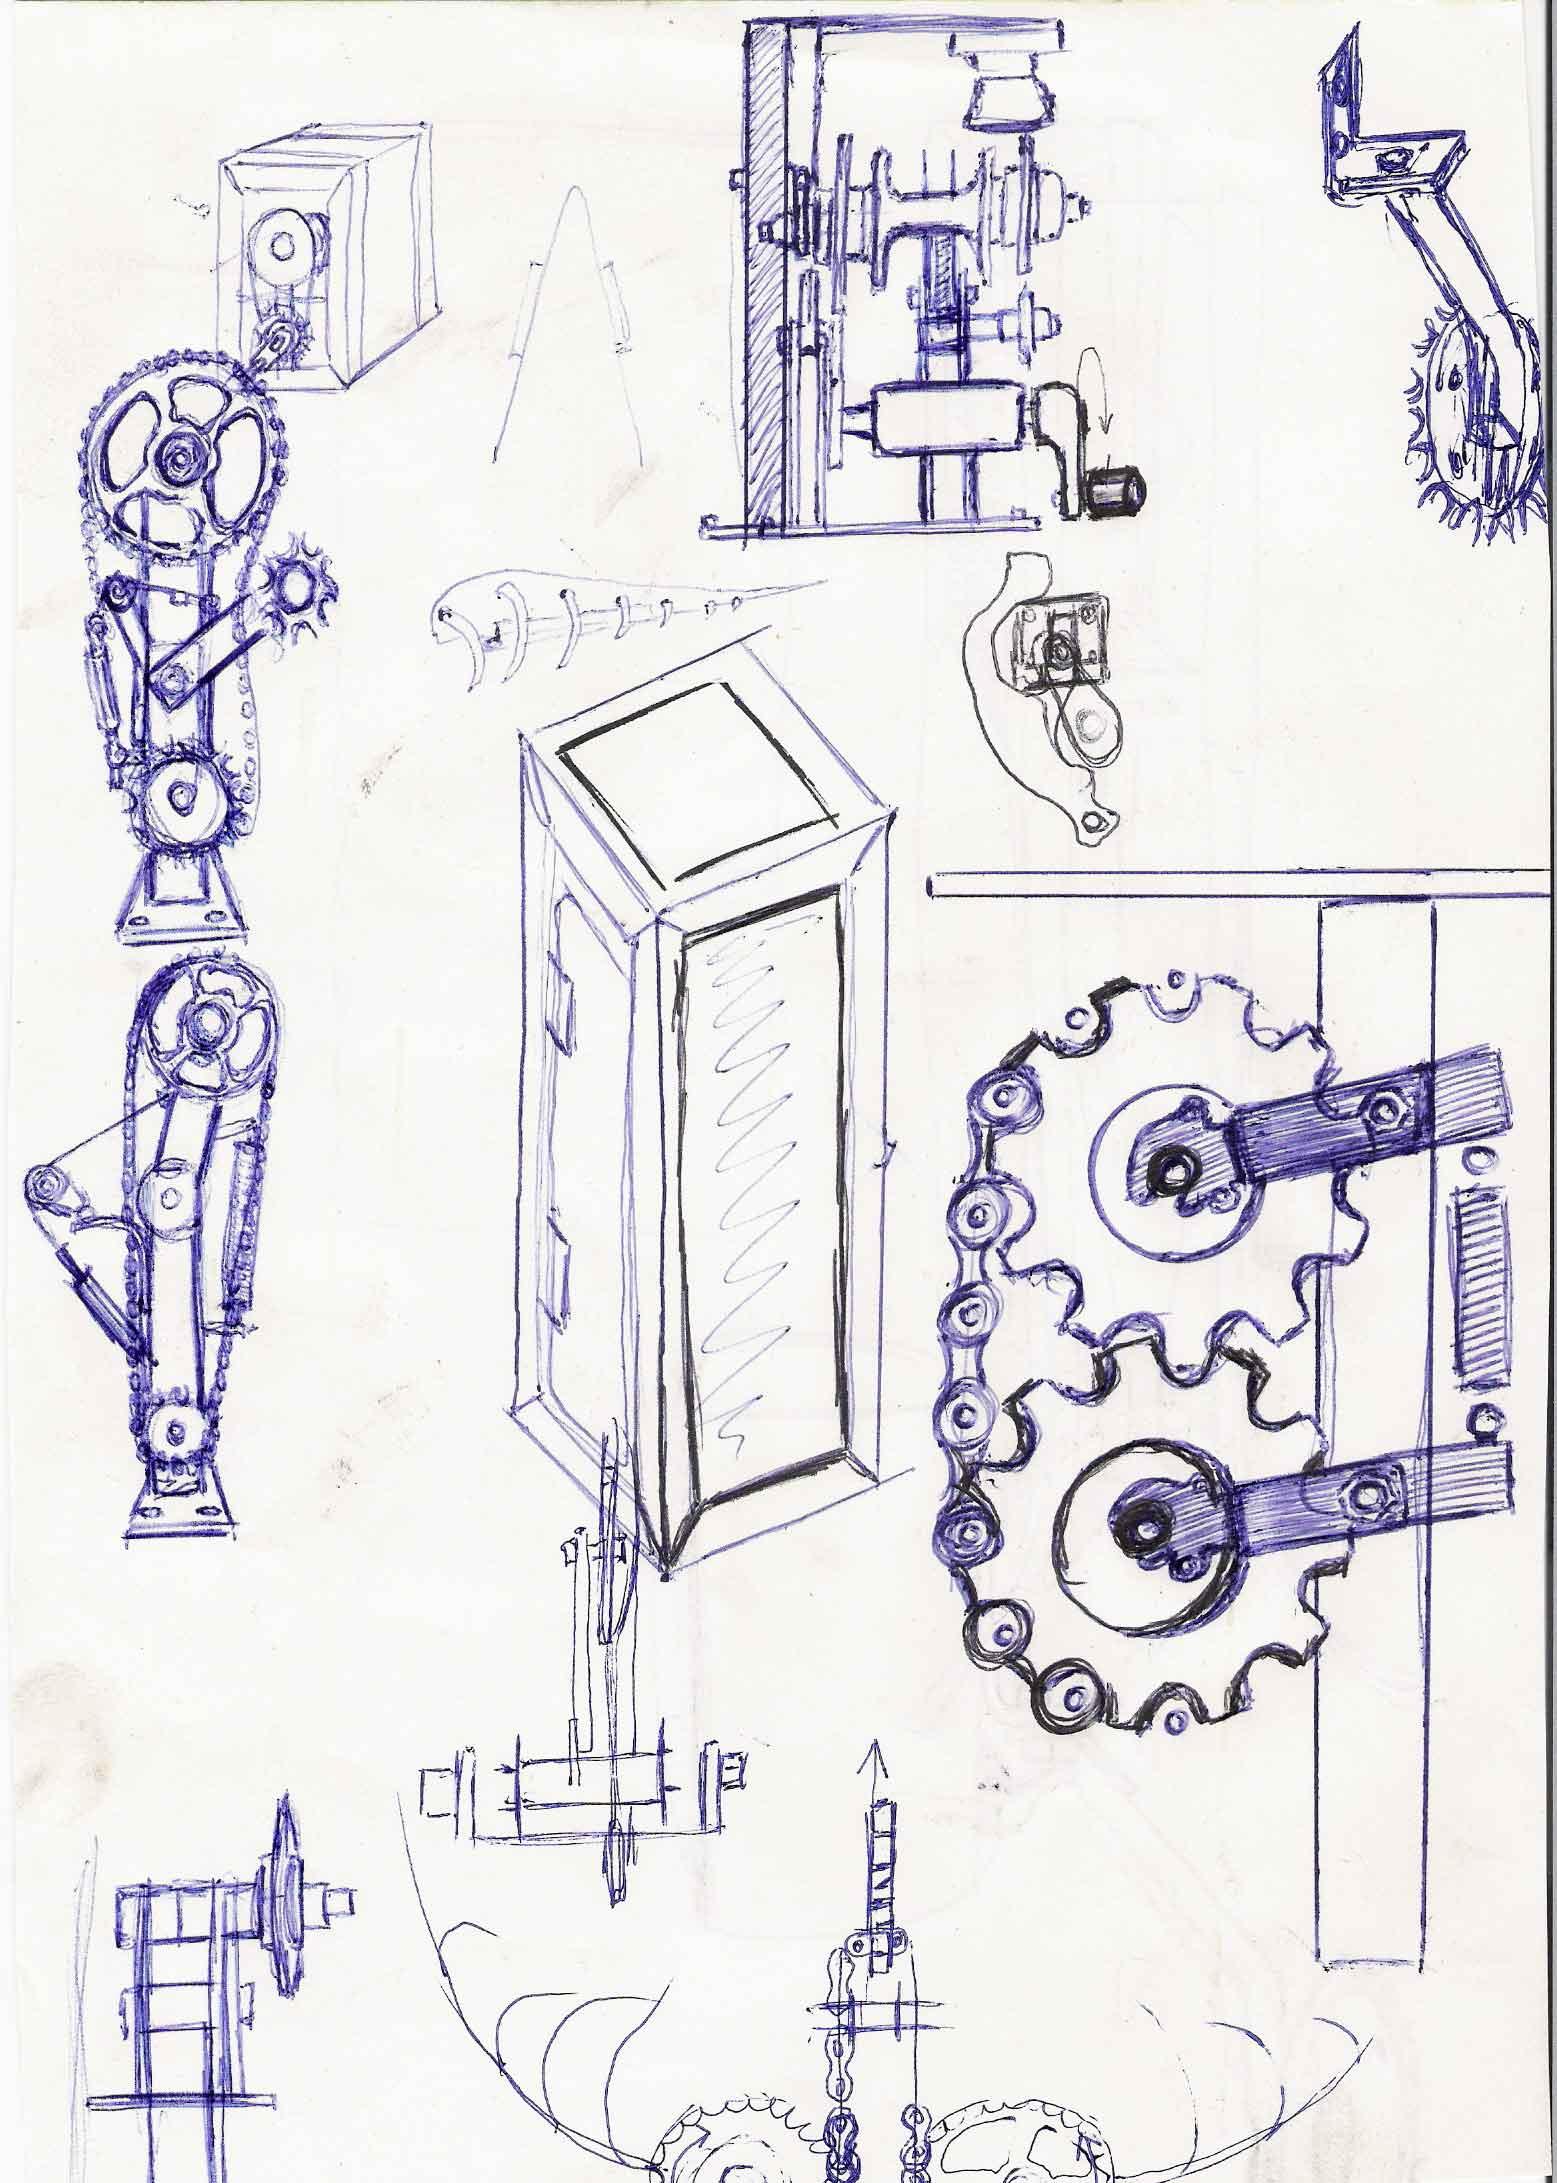 sketch-19-sept-05.jpg